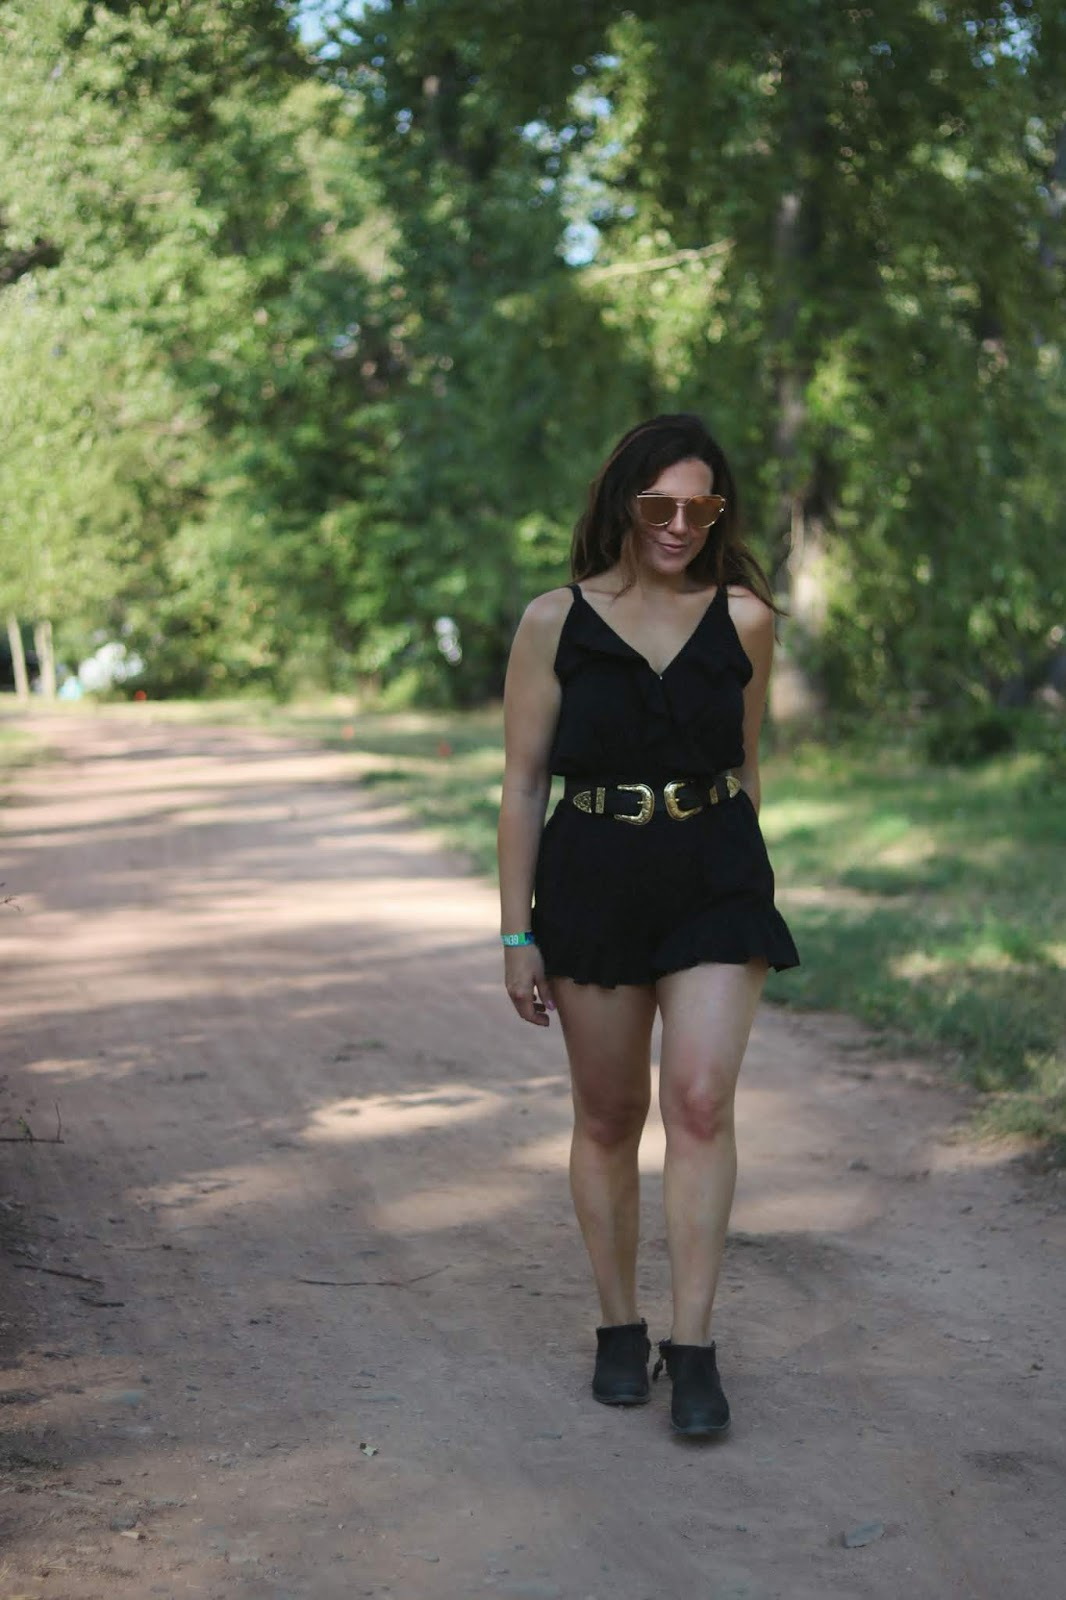 Country music festival outfit aleesha harris merritt rockin river fest